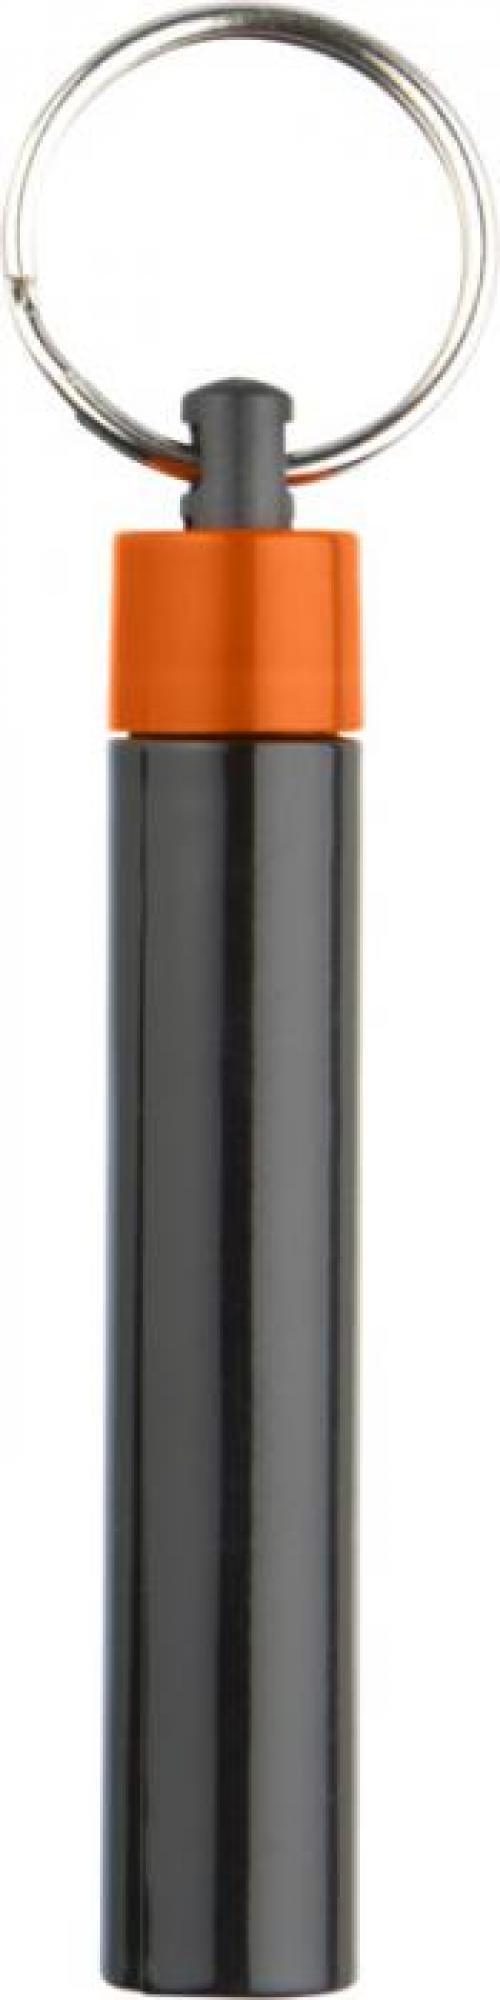 Llavero linterna premium Retro